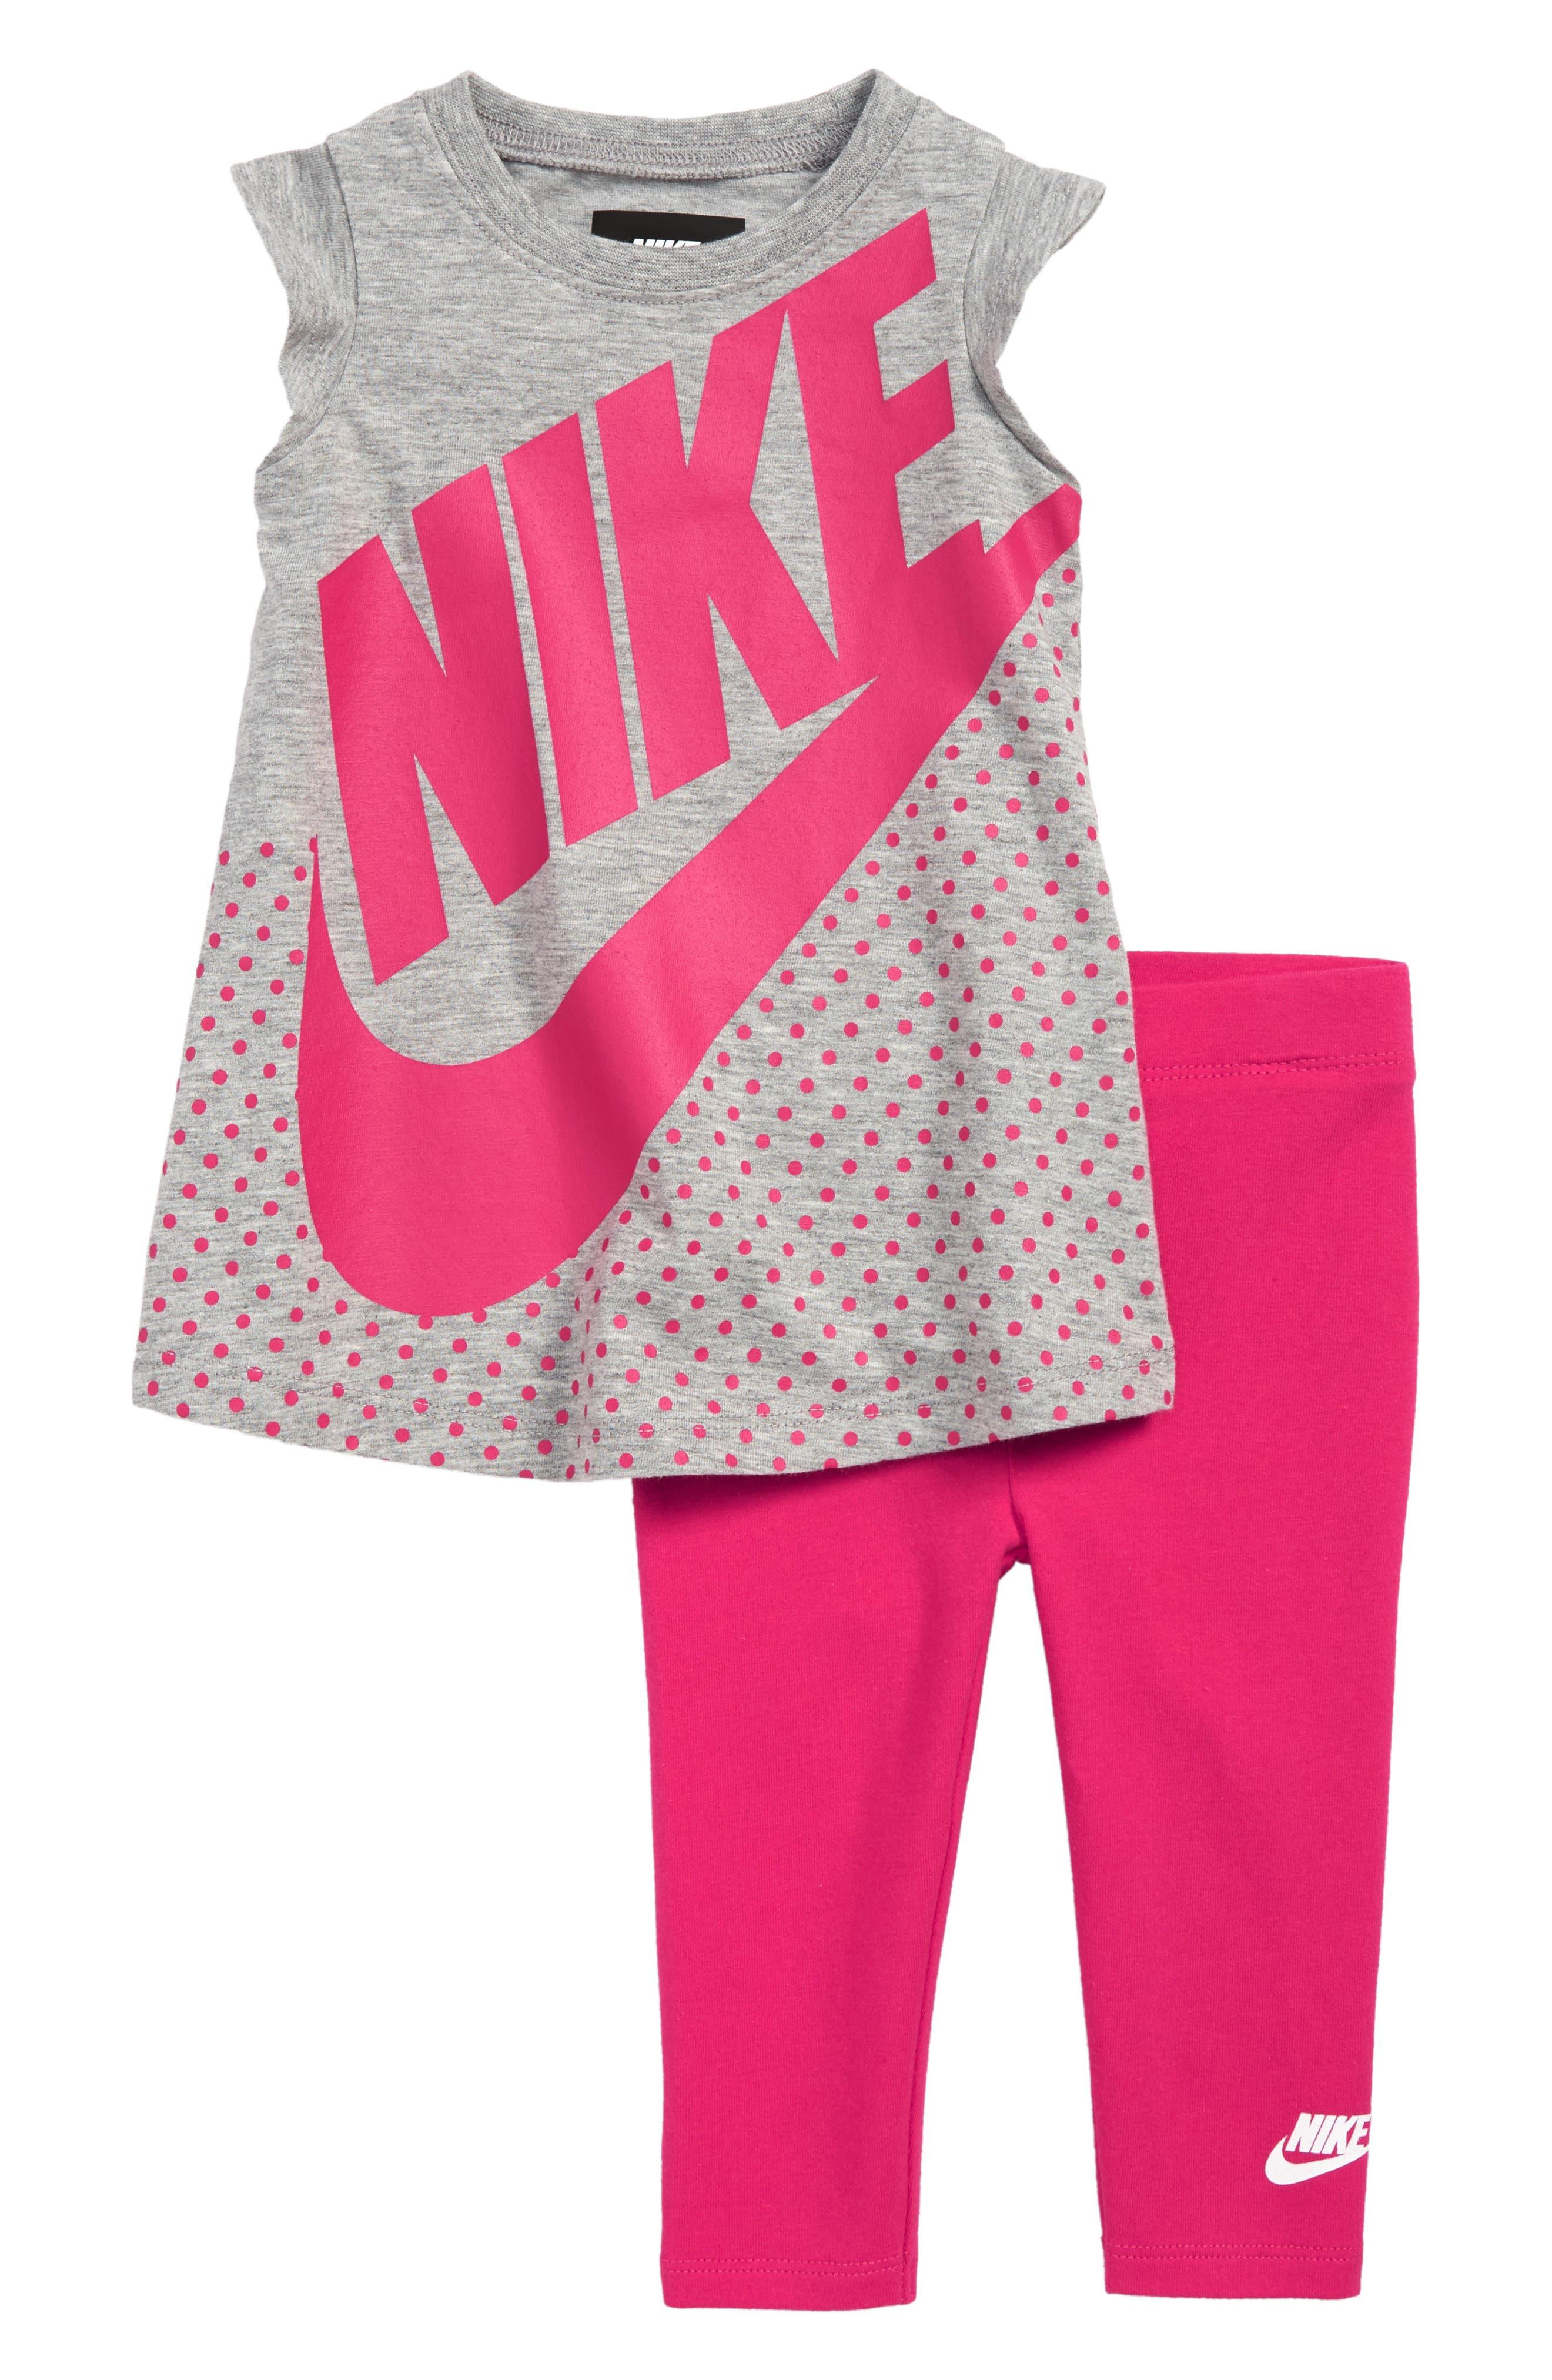 Futura Dress & Leggings Set,                         Main,                         color, DARK GREY HEATHER